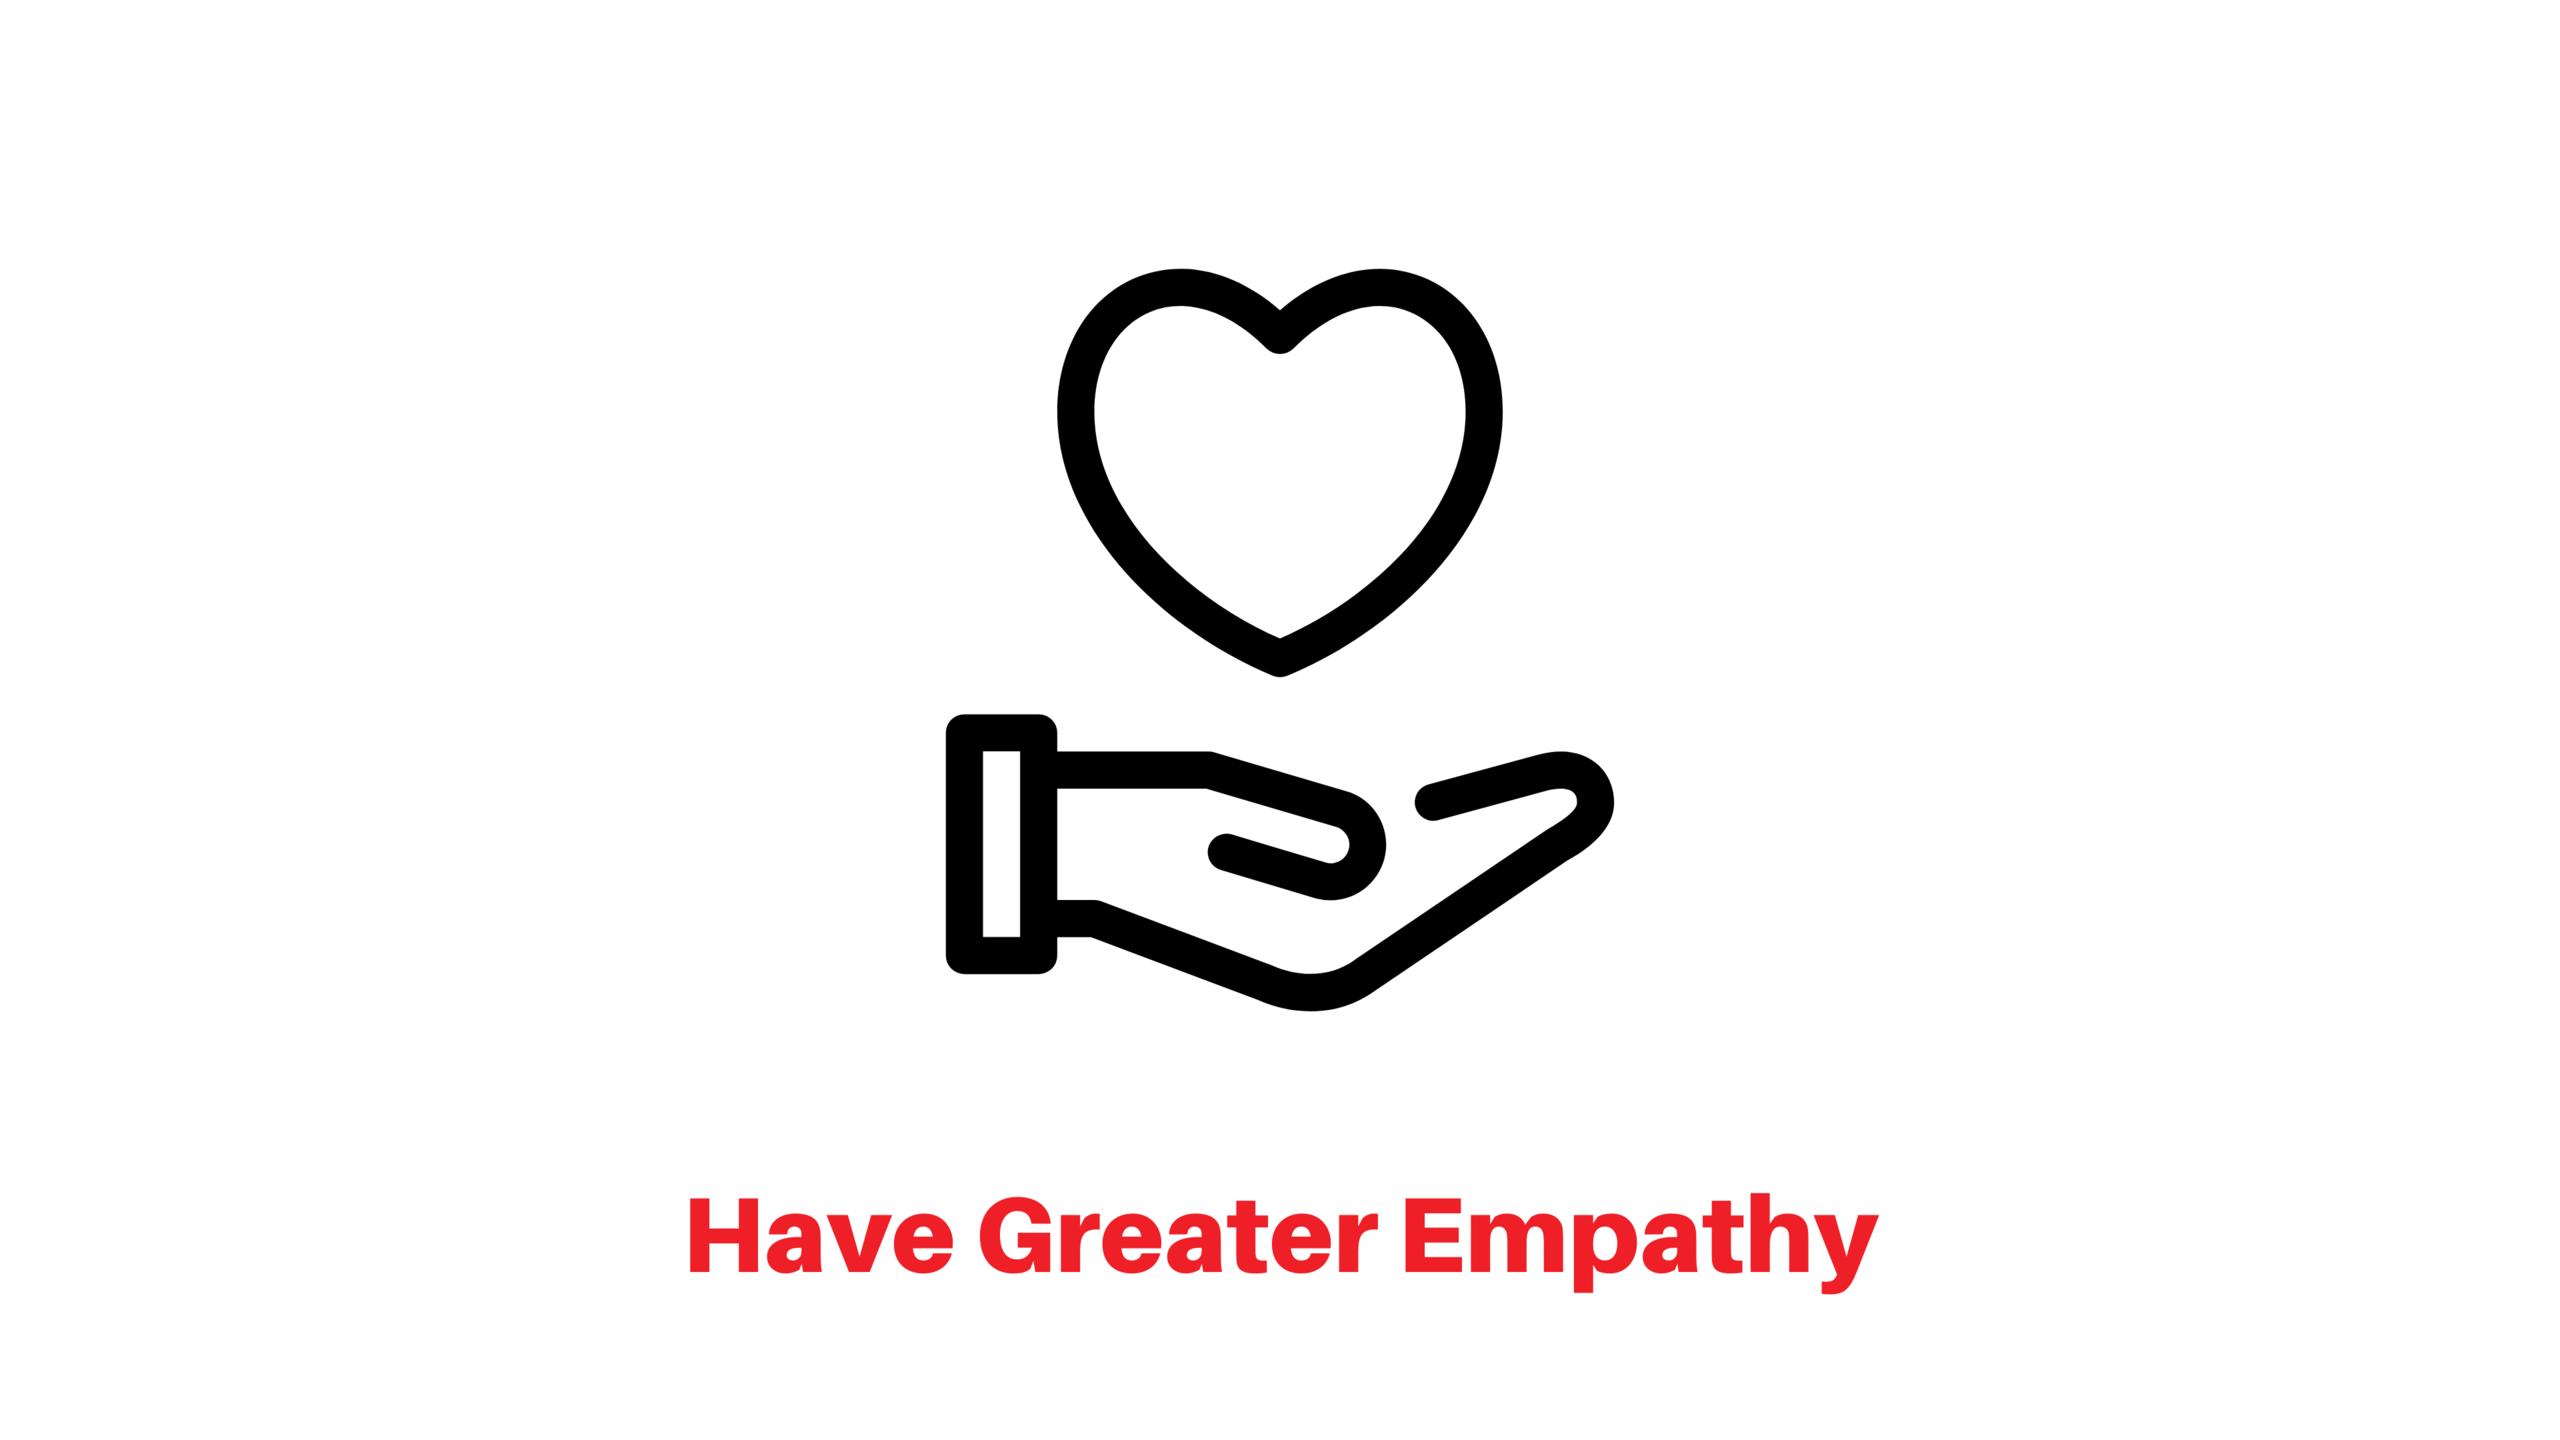 Have greater empathy ocon